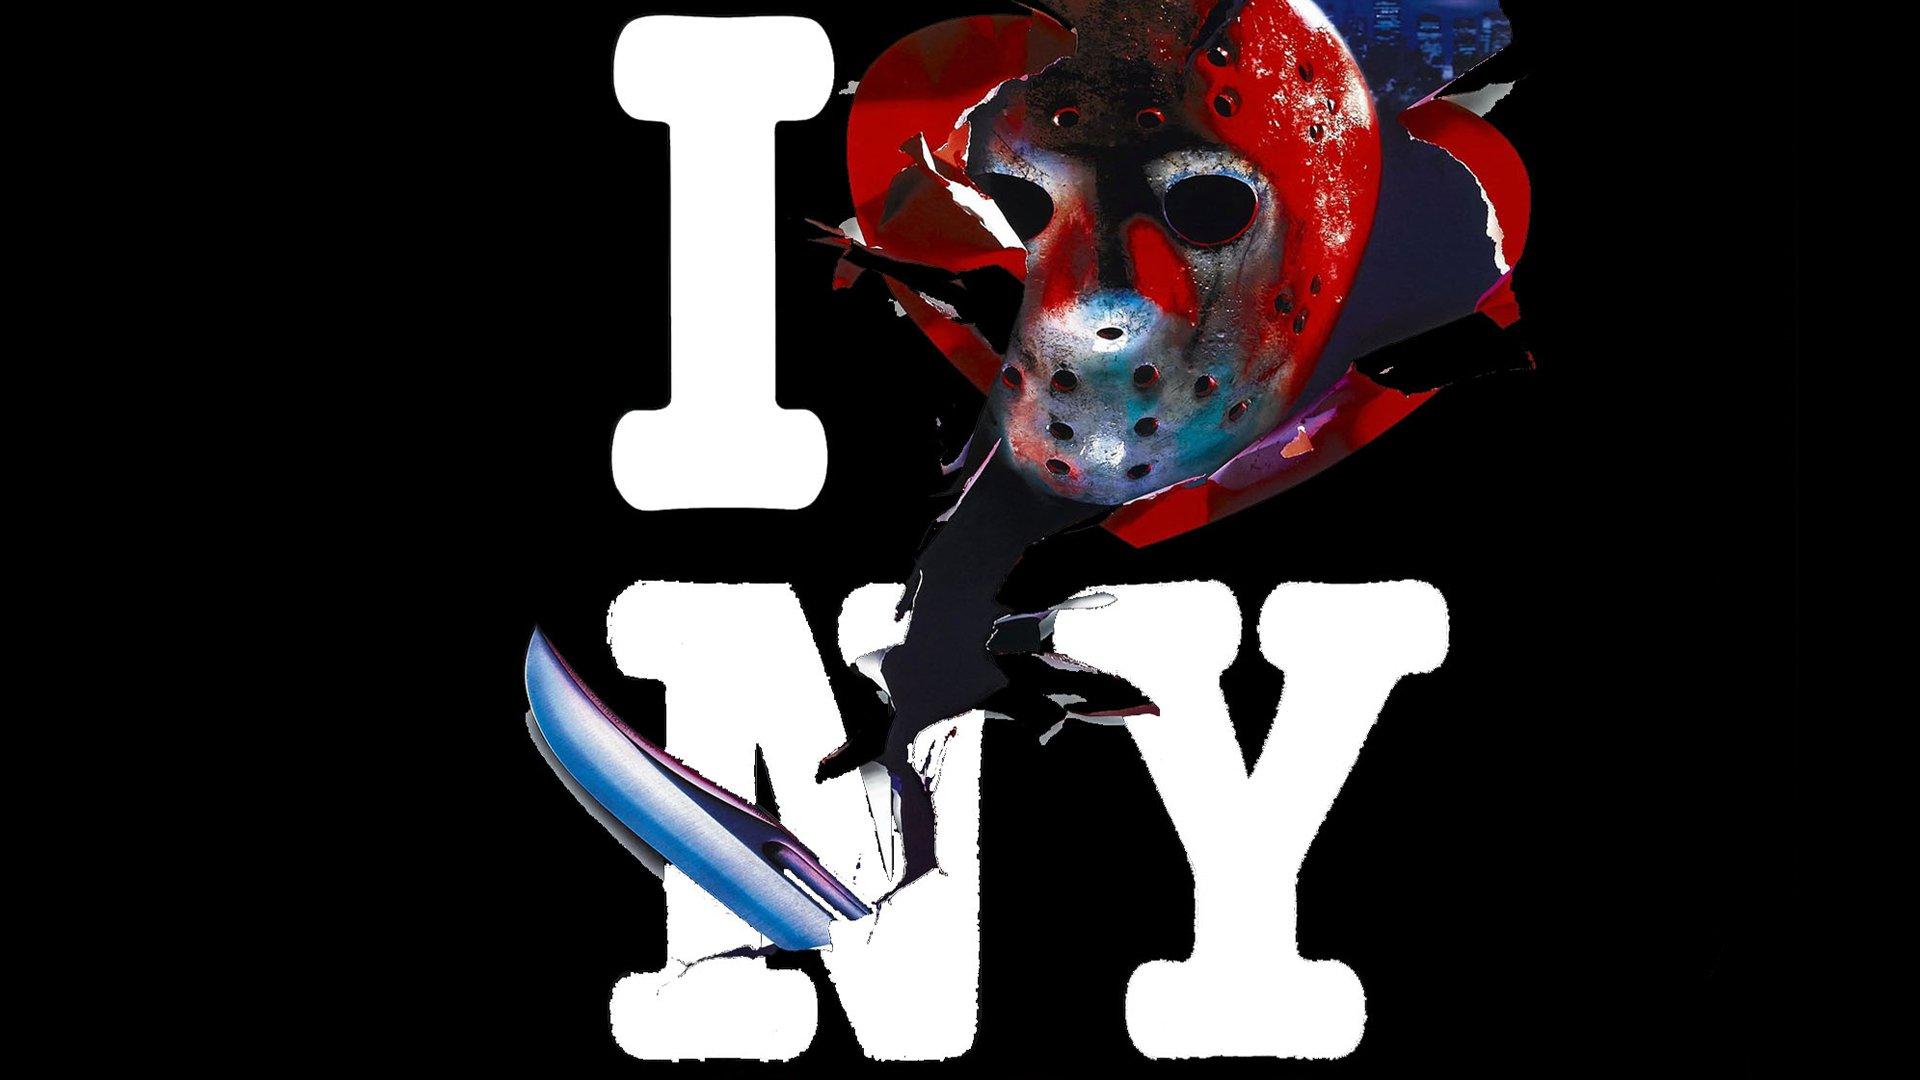 I Love Jason Wallpapers : Friday the 13th Part VIII: Jason Takes Manhattan Movie fanart fanart.tv